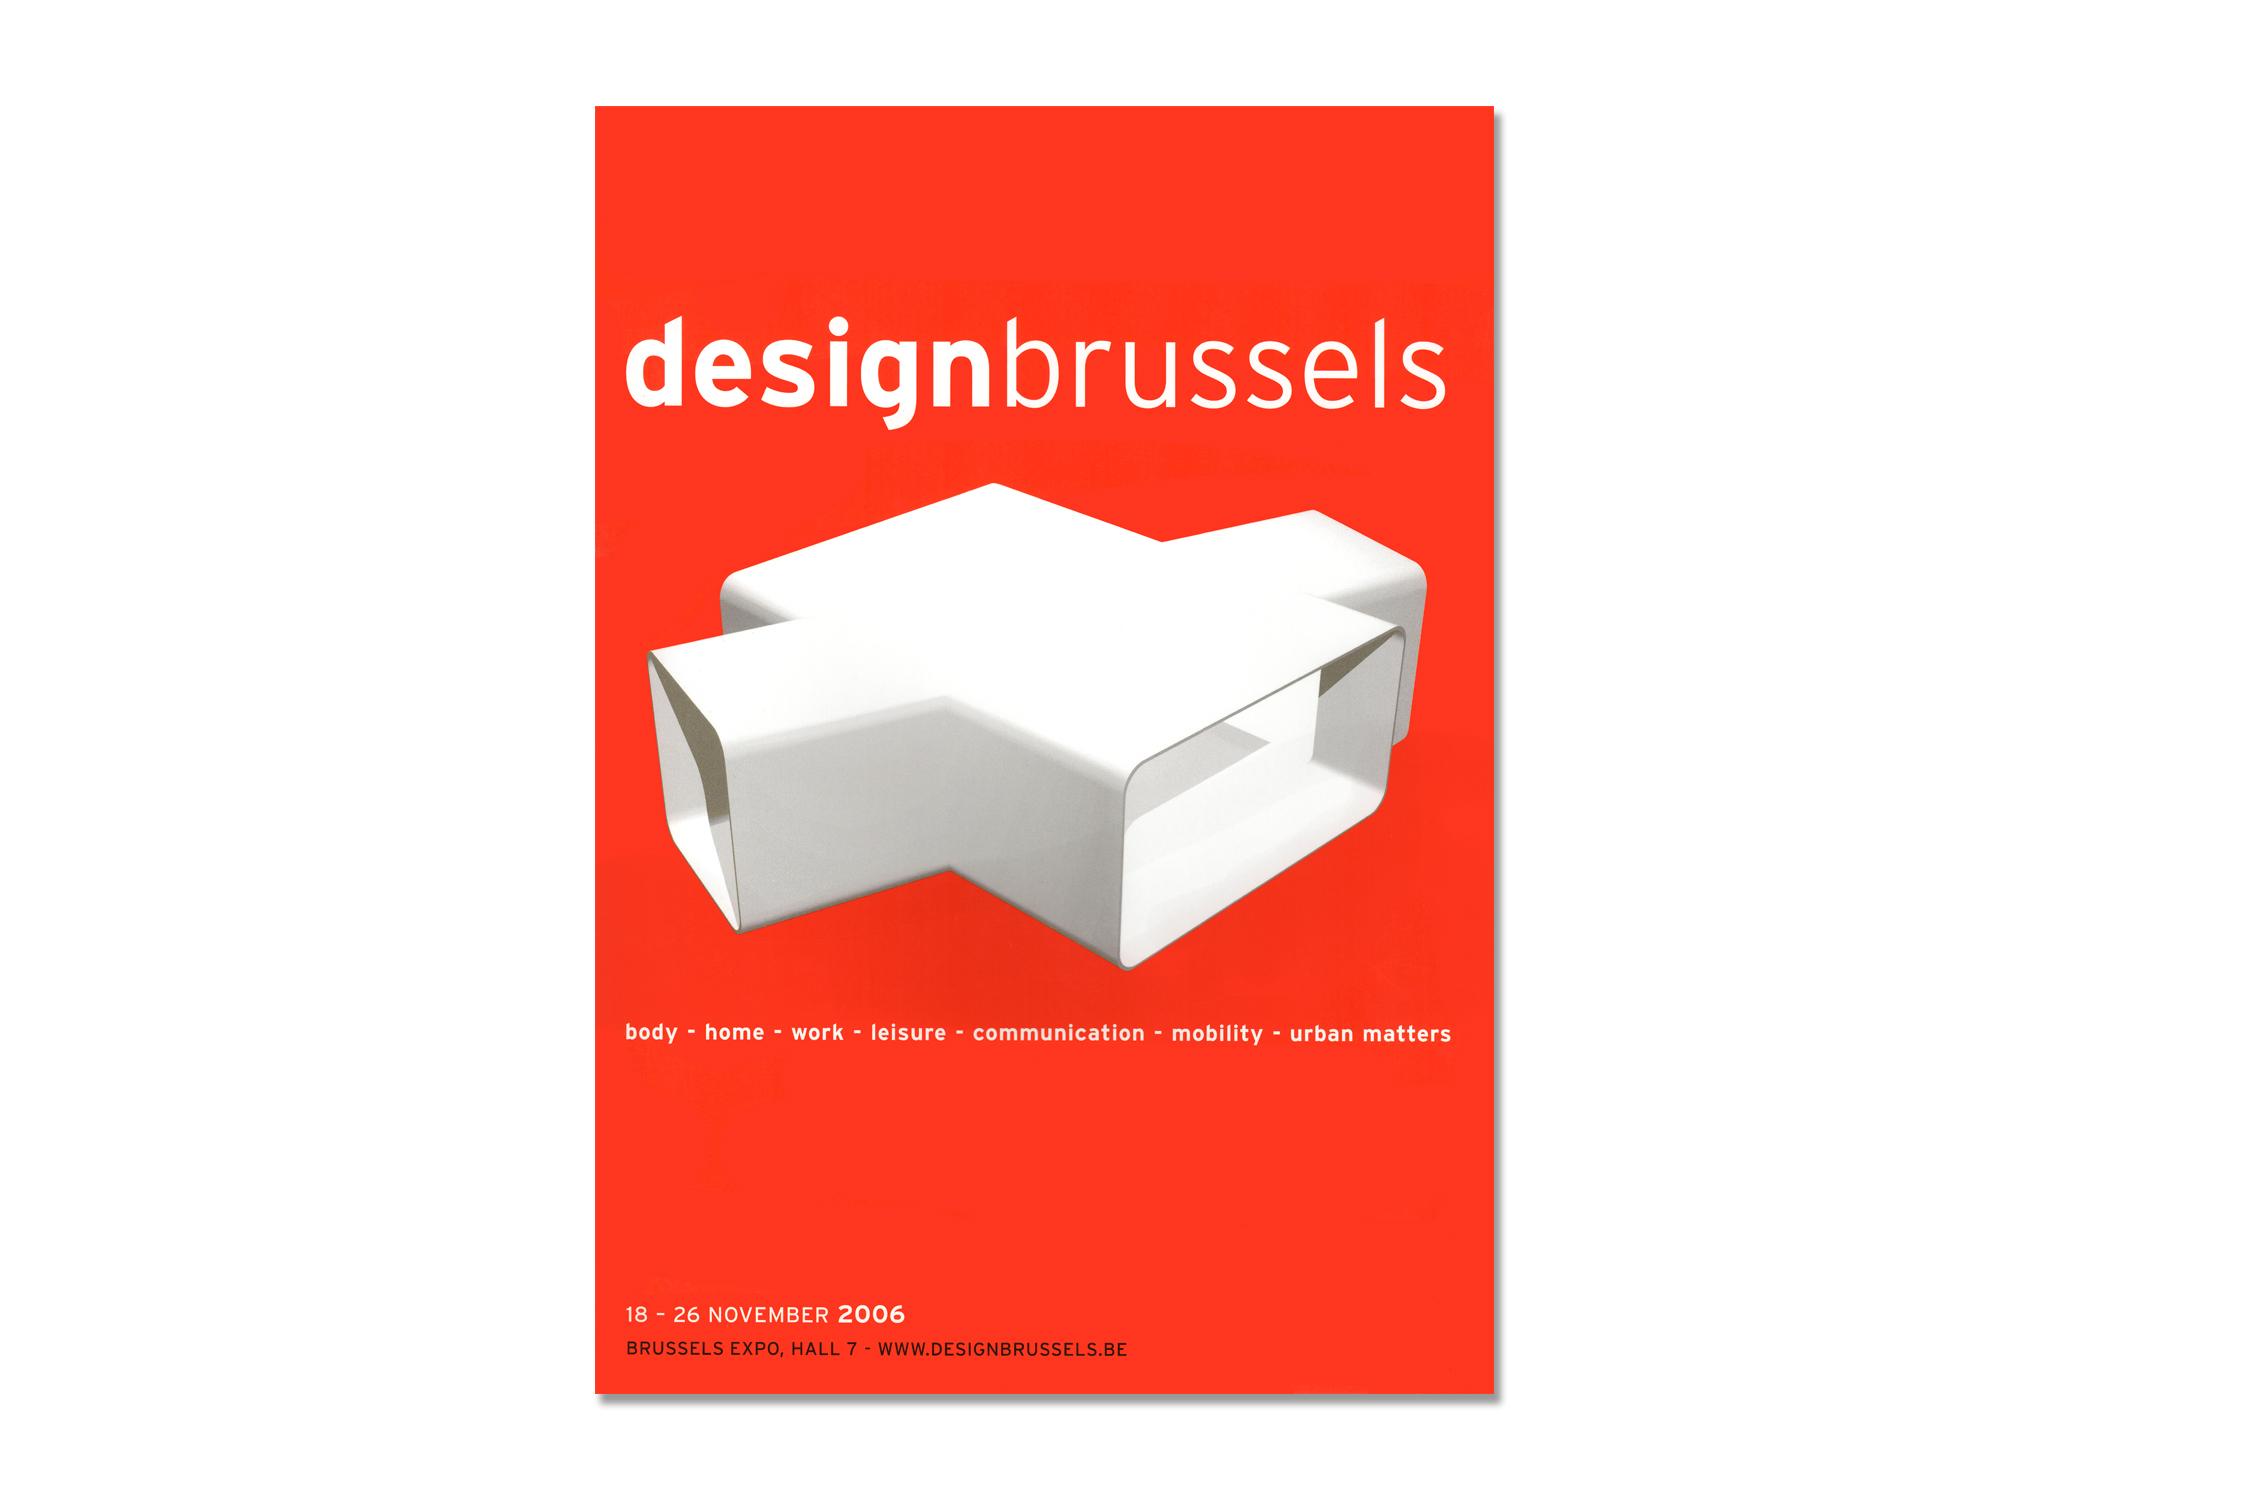 studiodannyvenlet_oddsandends_logo_designbrussels_5.jpg